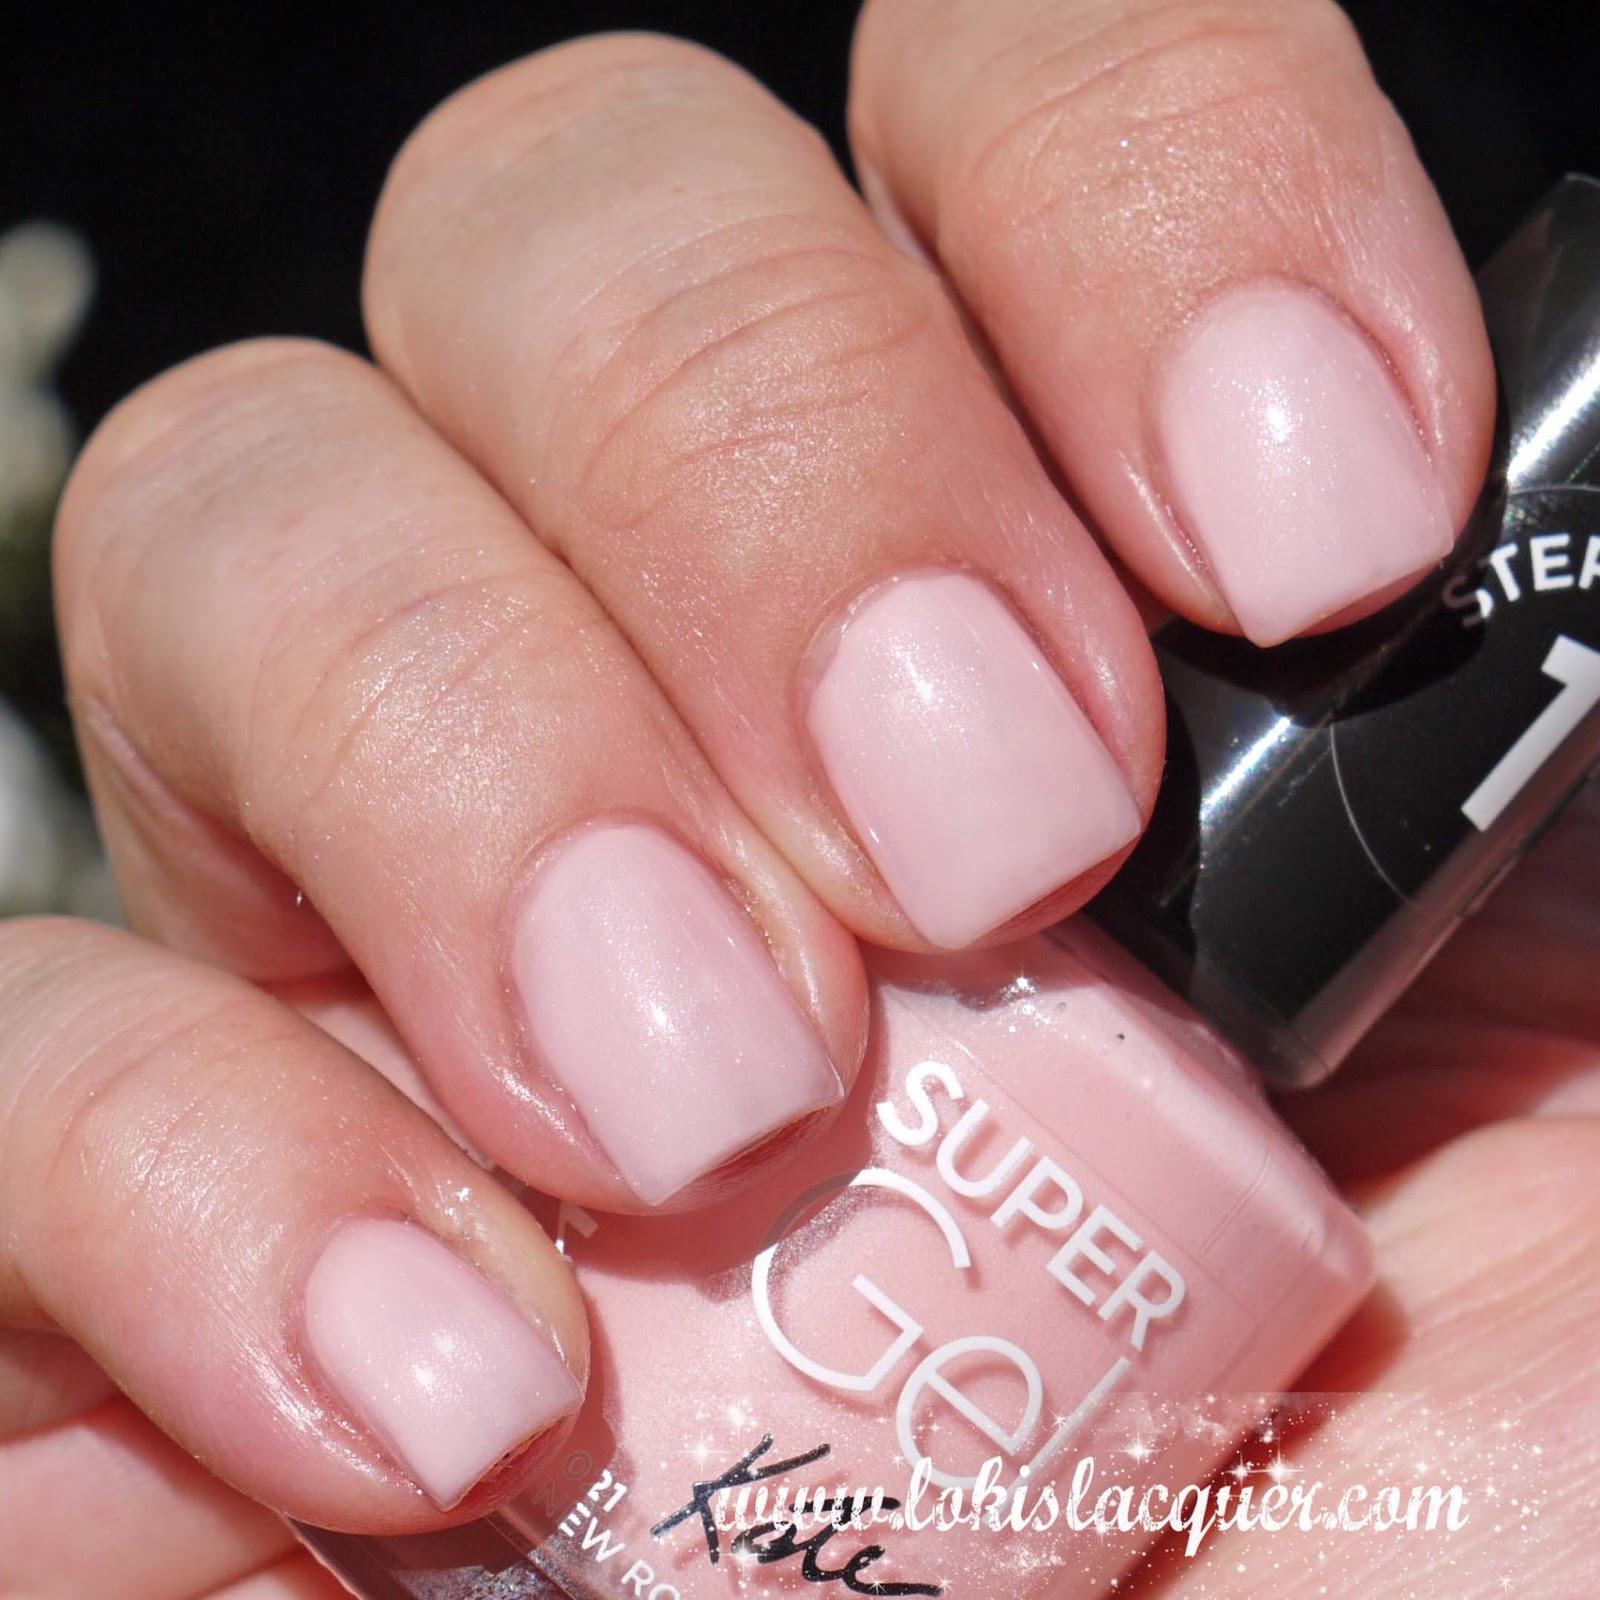 Rimmel gel nail polish set nail ftempo for 4 sisters nail salon hours